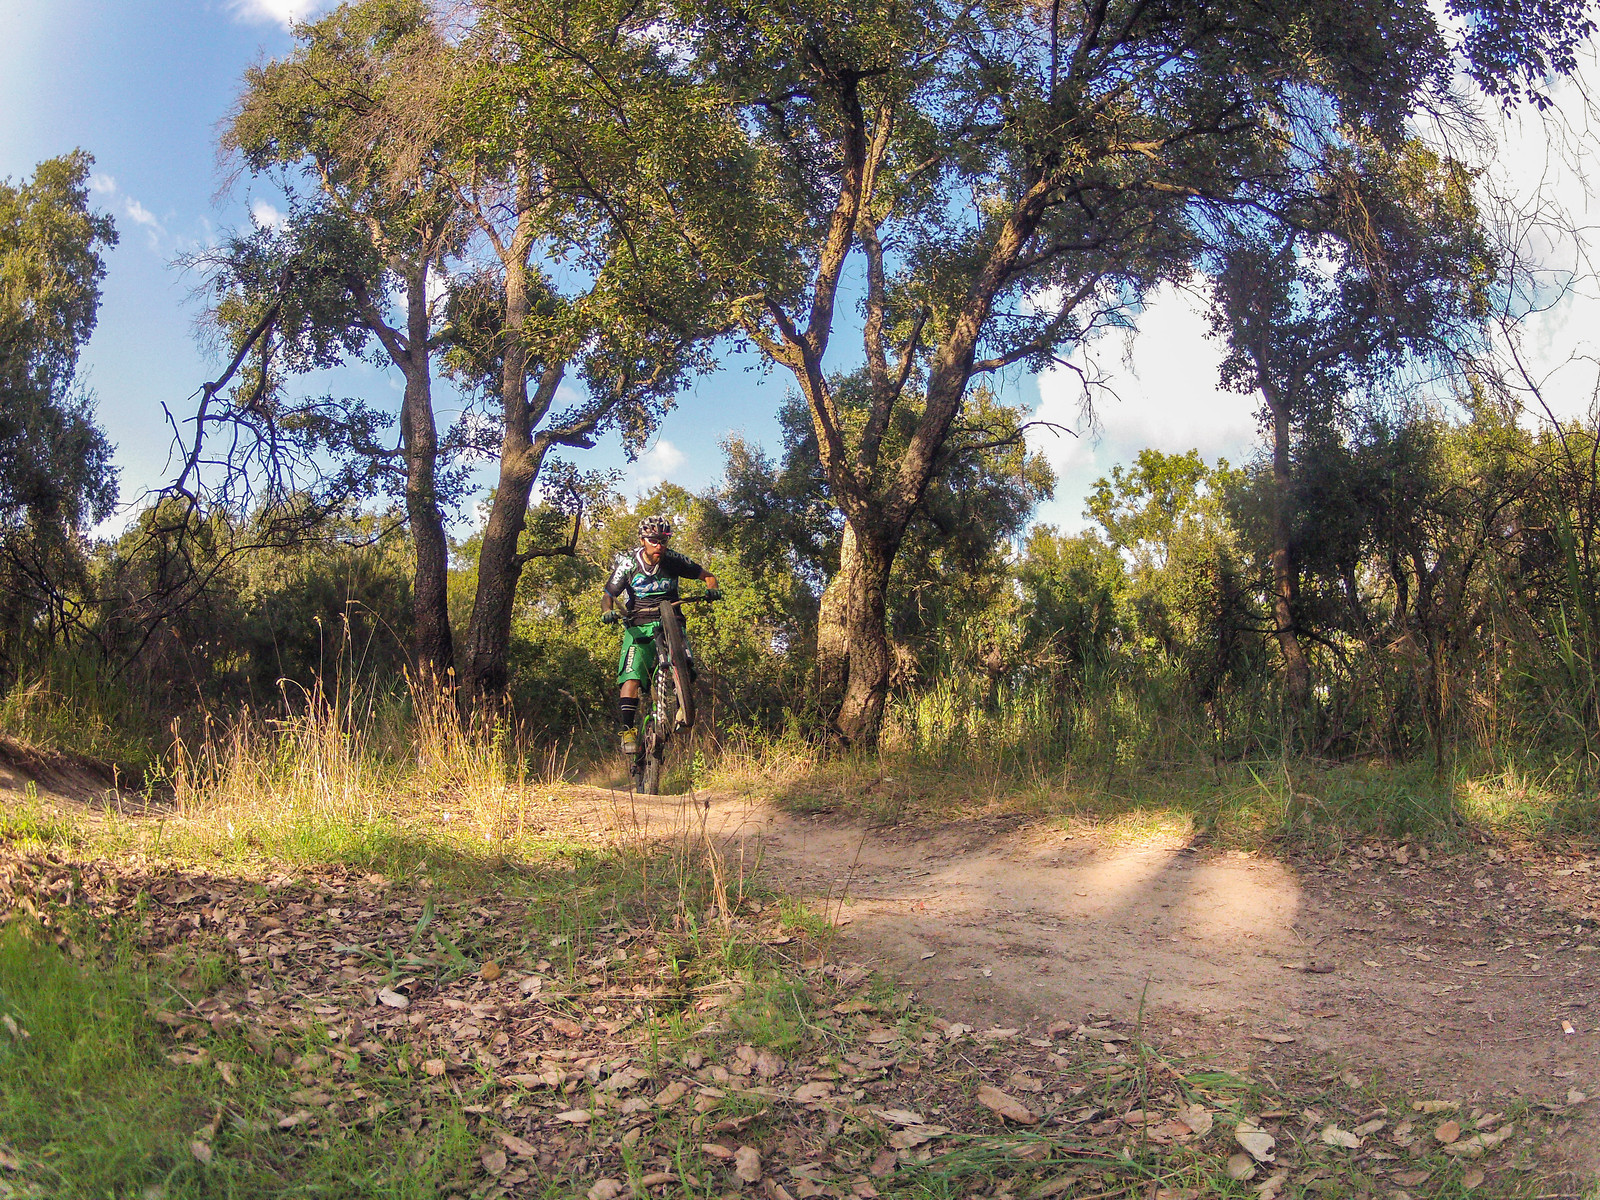 Manual at Pineta Sacchetti Rome - Gladiax87 - Mountain Biking Pictures - Vital MTB